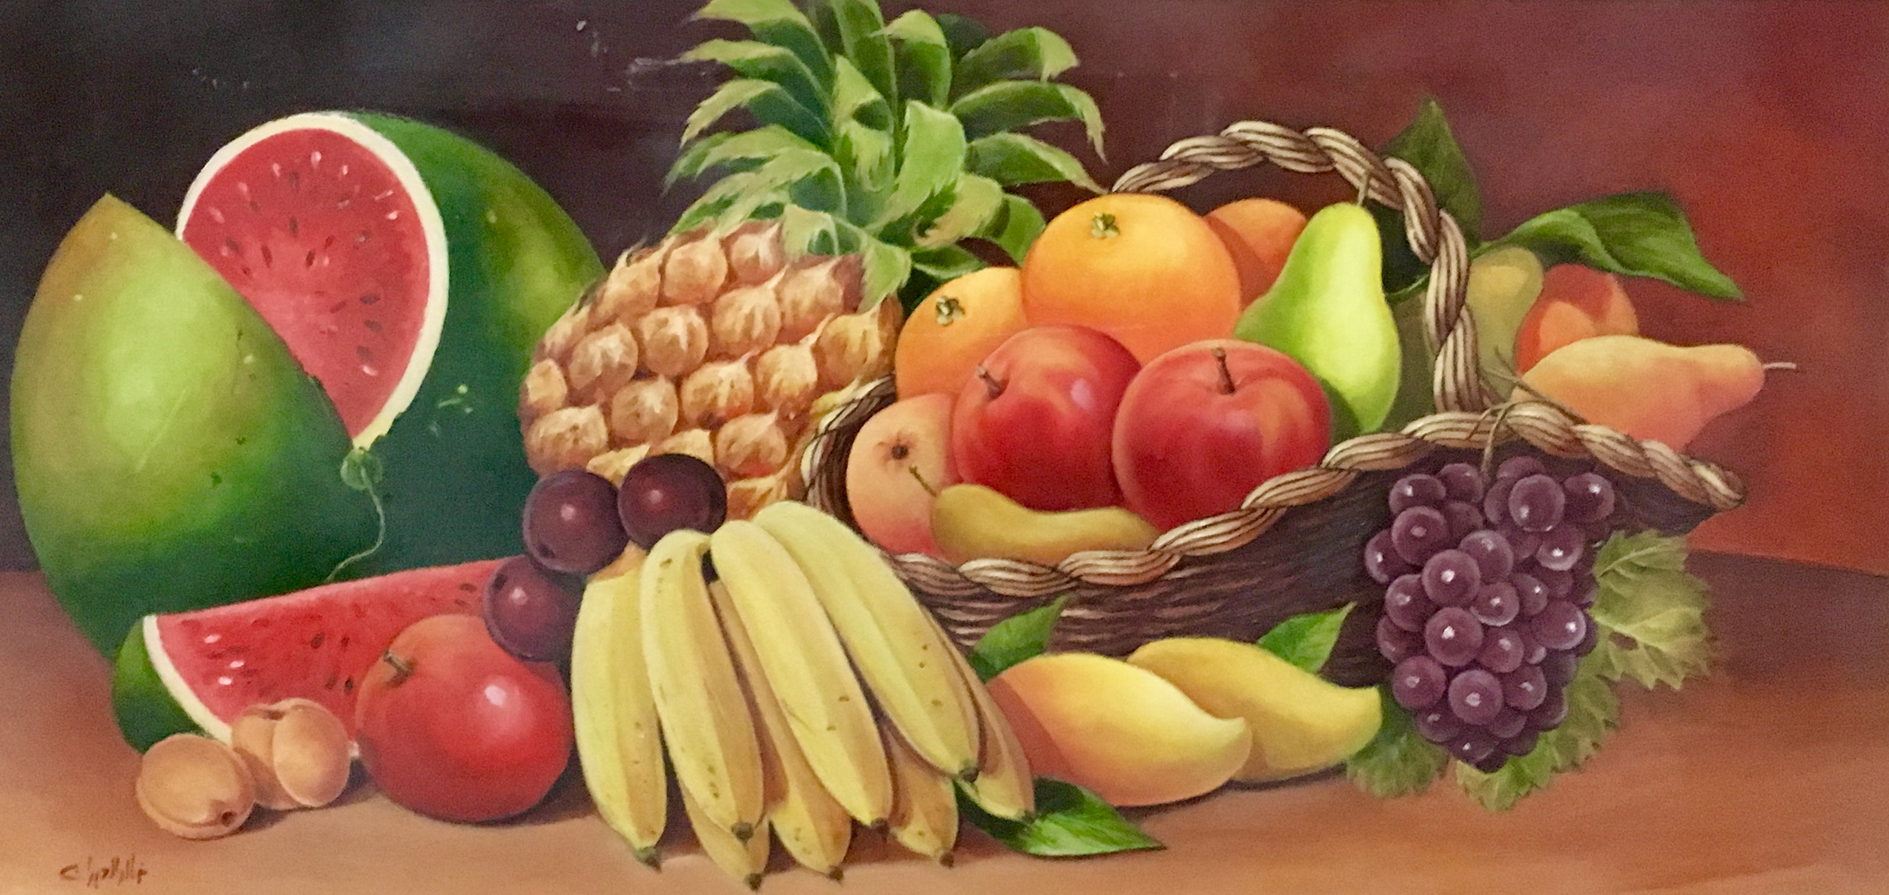 121_206 - (c) Artist Khaled Al Abdan 76 in 38 oil on canvas - الفنان خالد العبدان.JPG